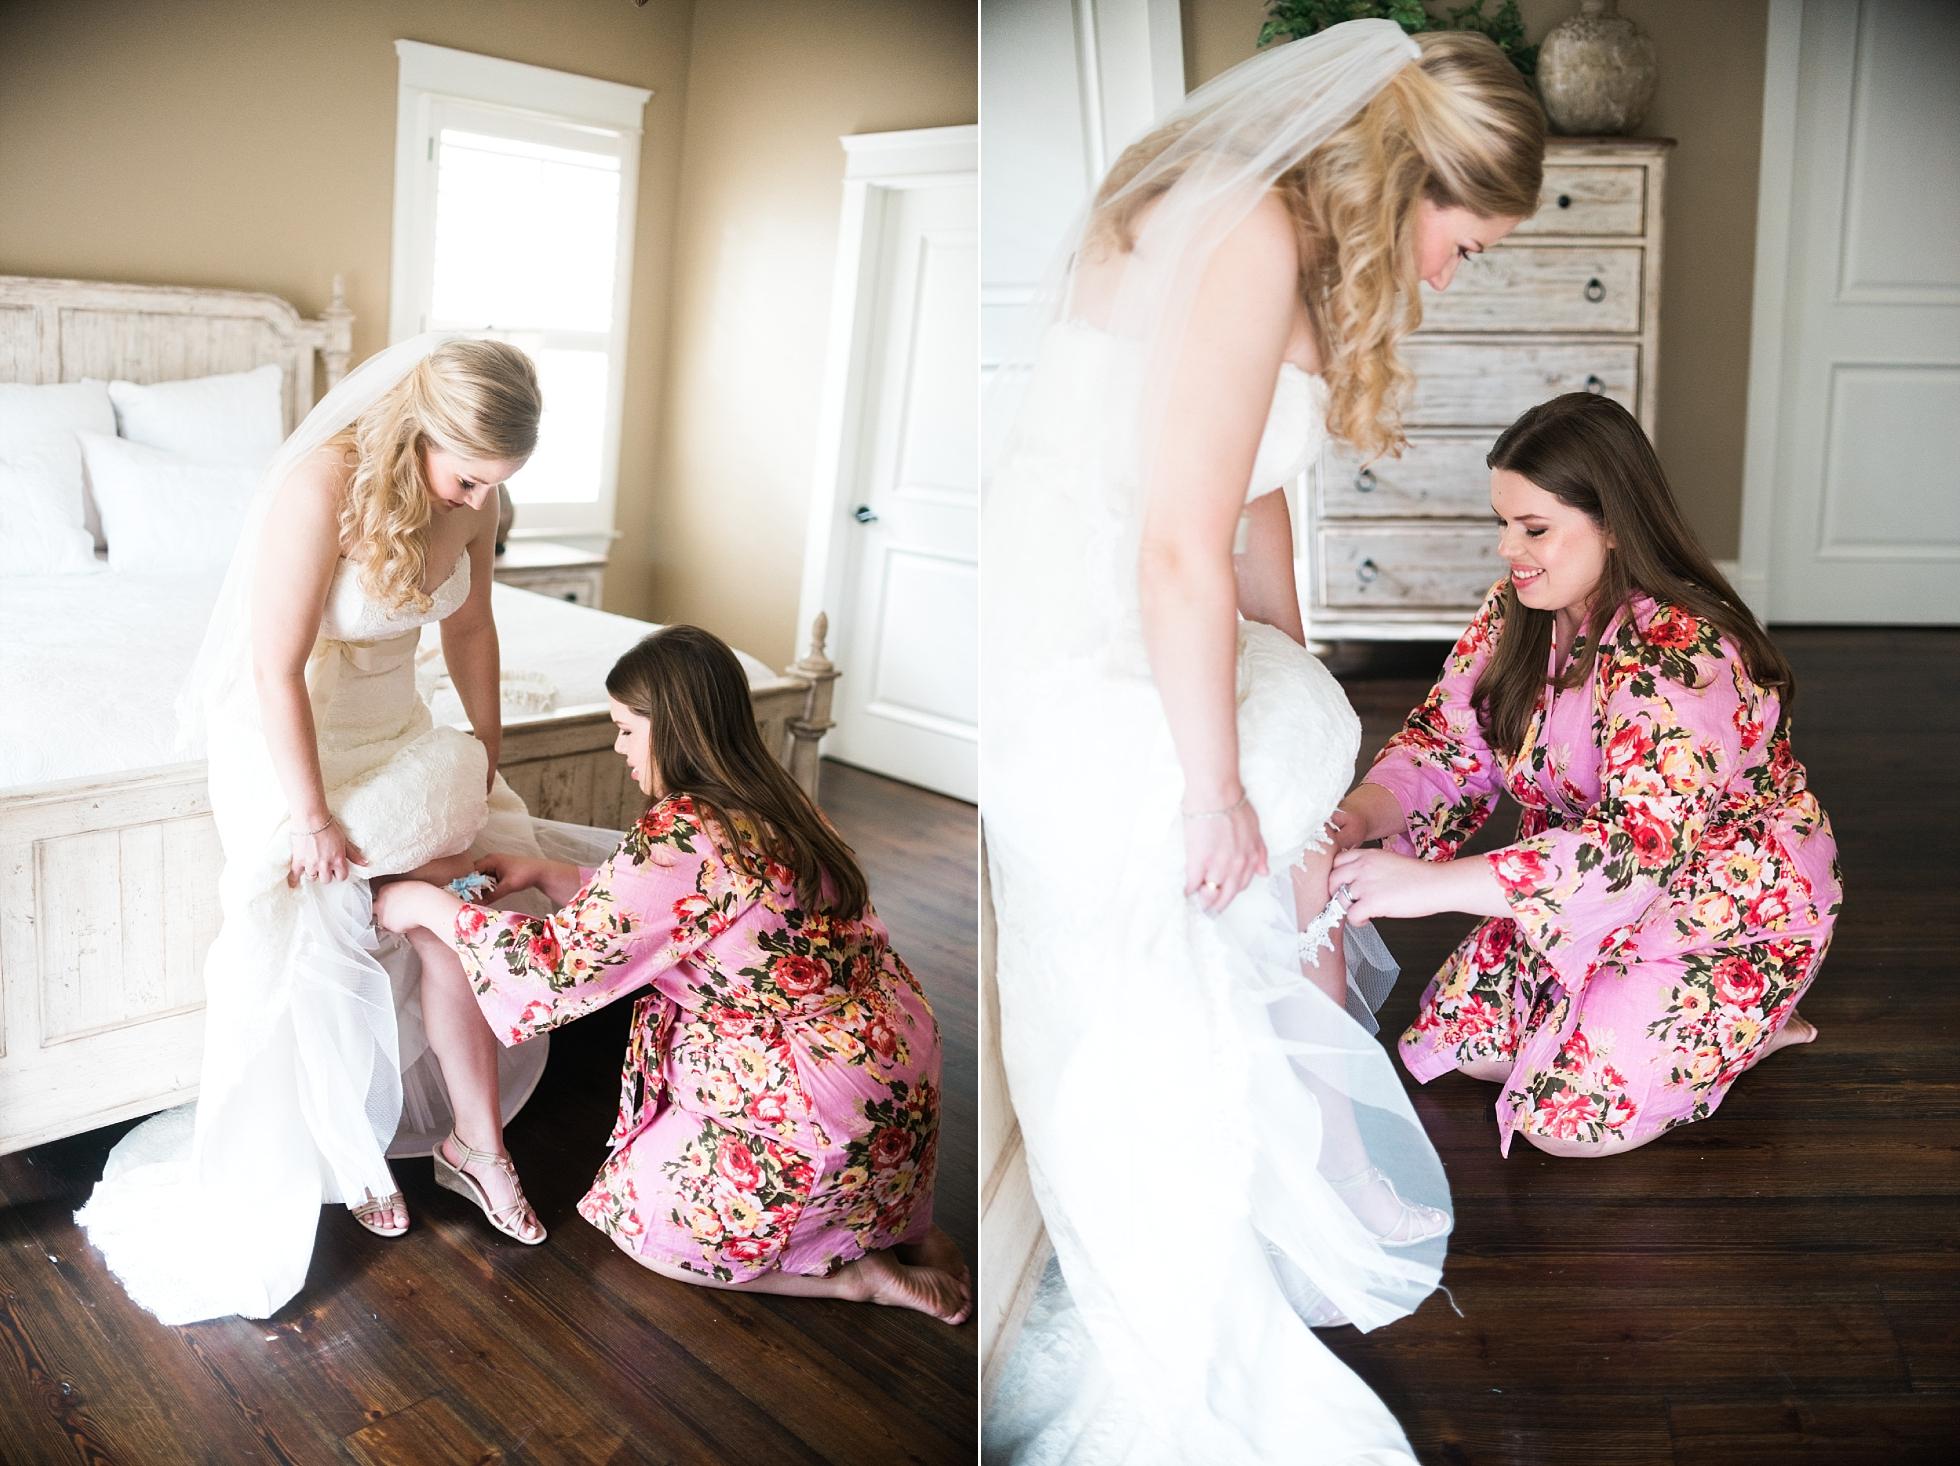 Bride getting in dress | Kyle & Erin | Scarbrough Wedding | Children's Harbor | Laura Wilkerson Photography